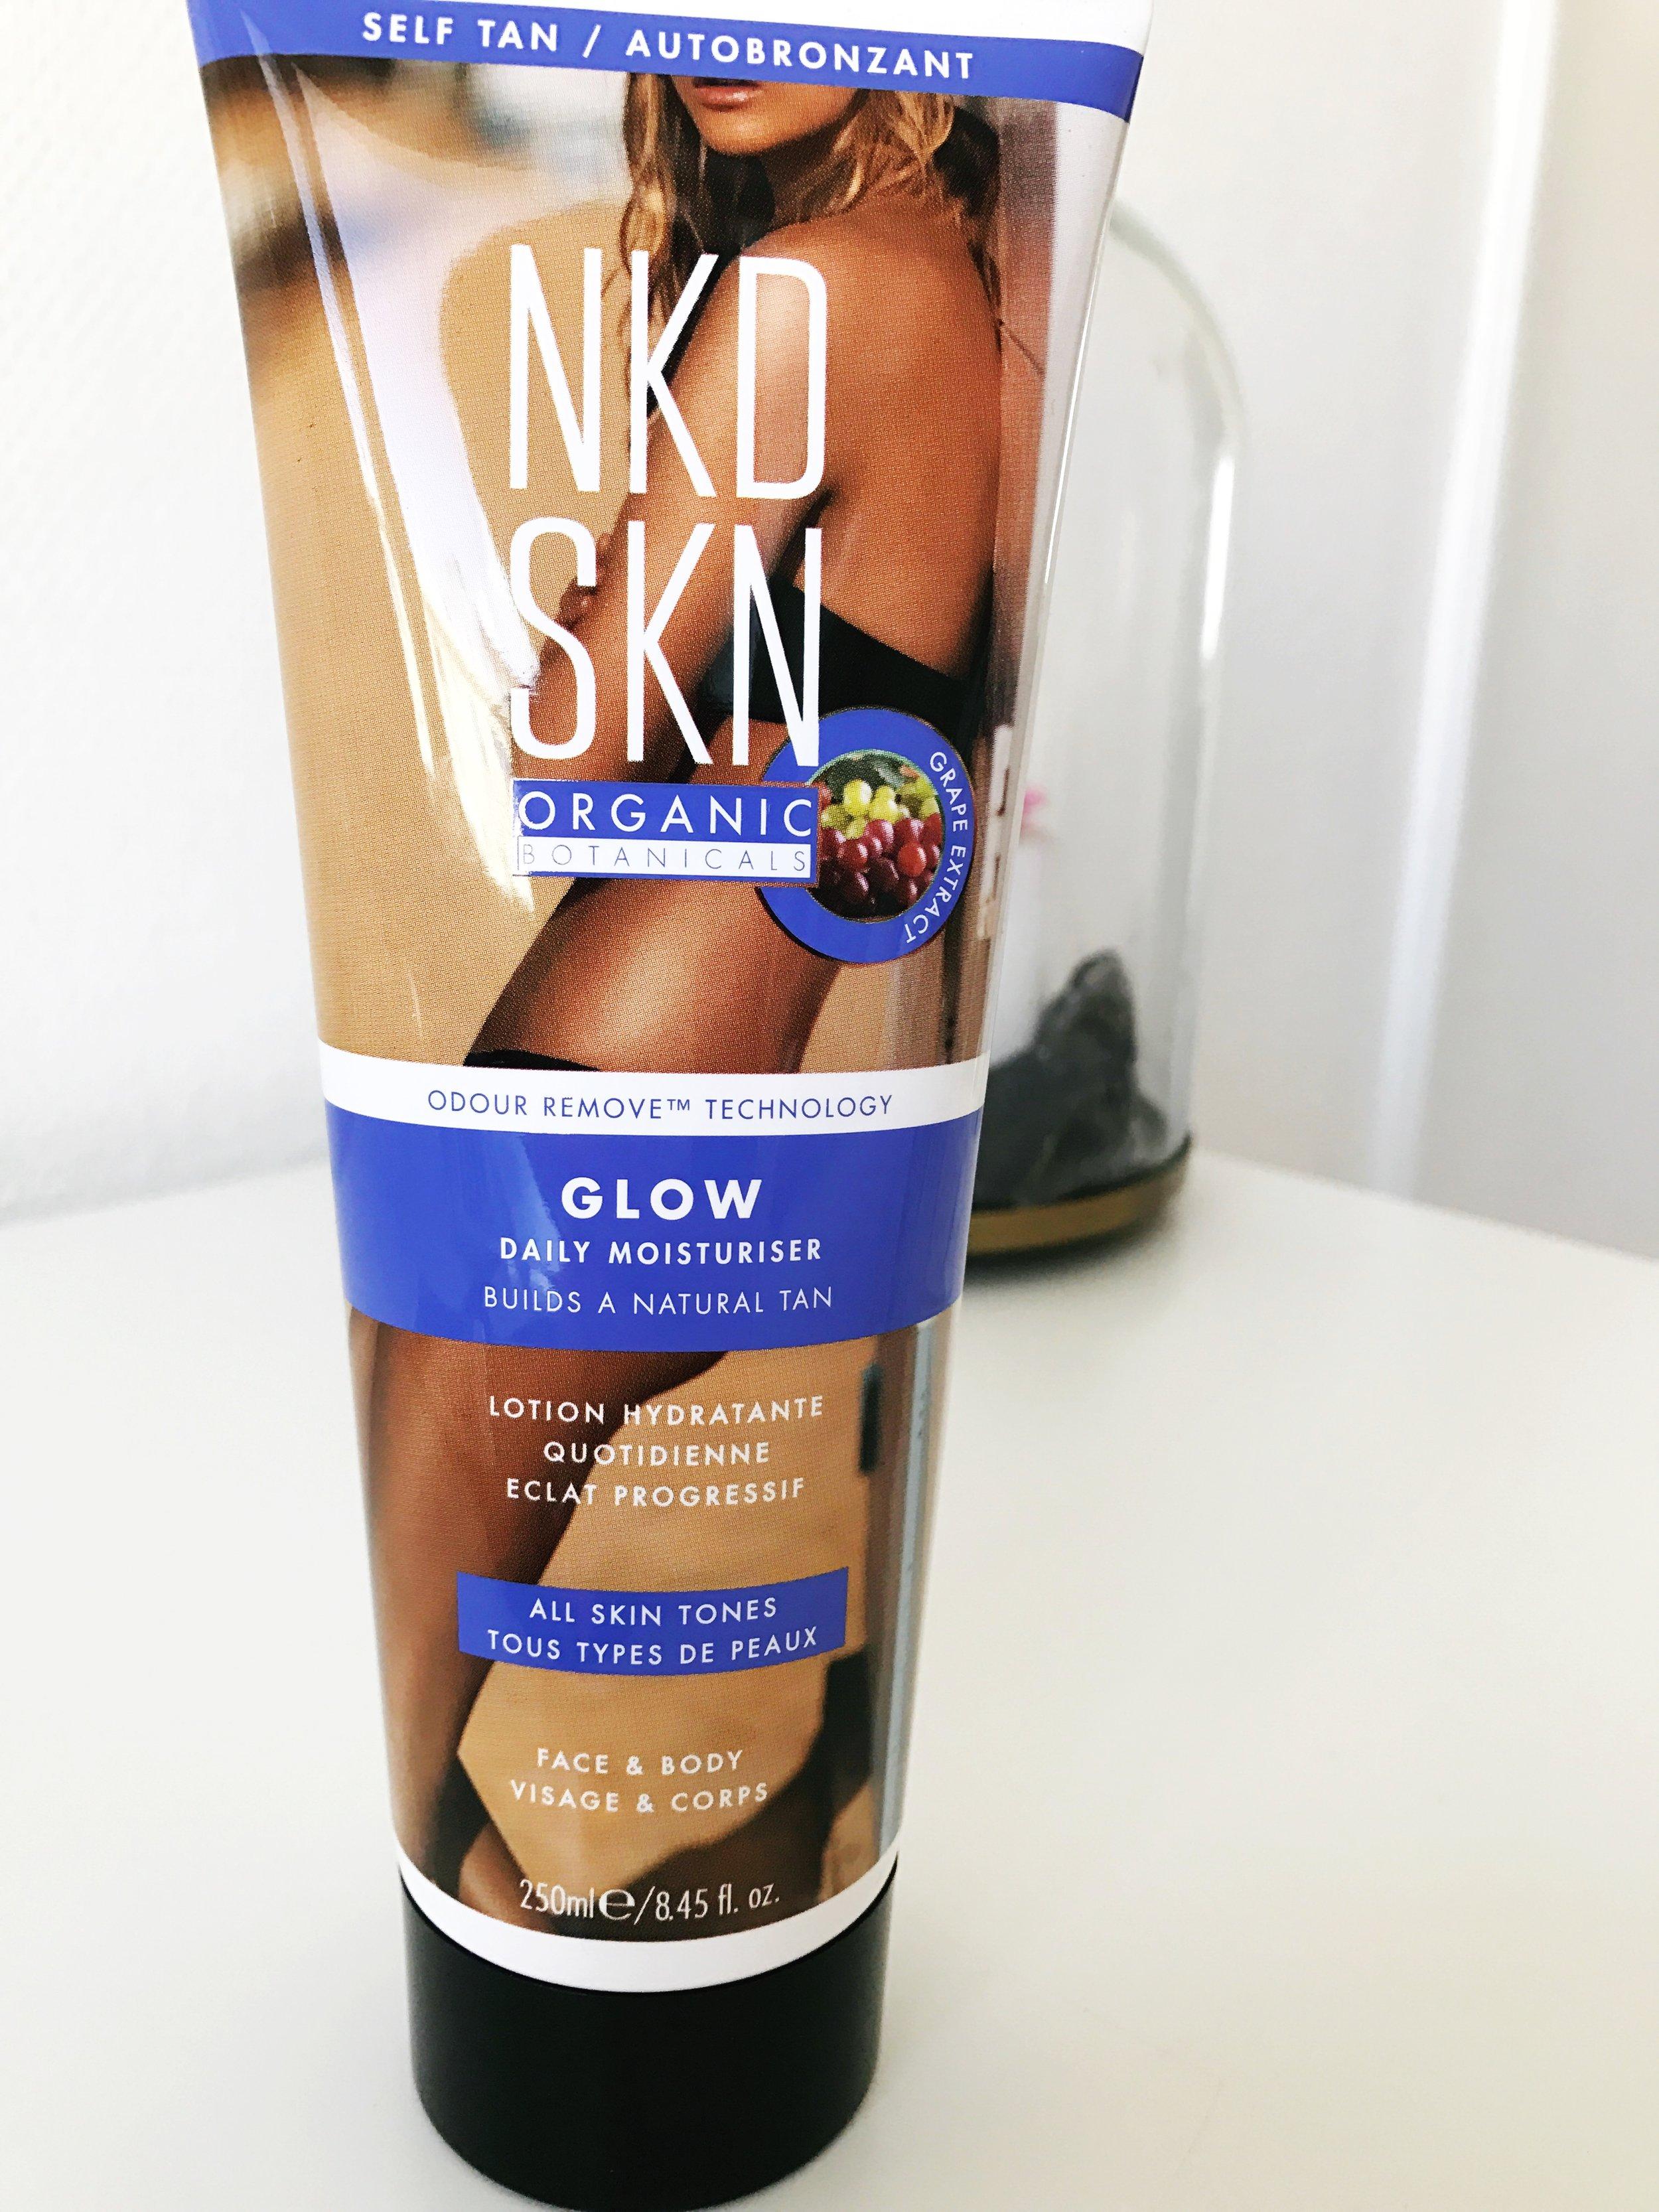 NKD Skin Glow Daily Moisturiser